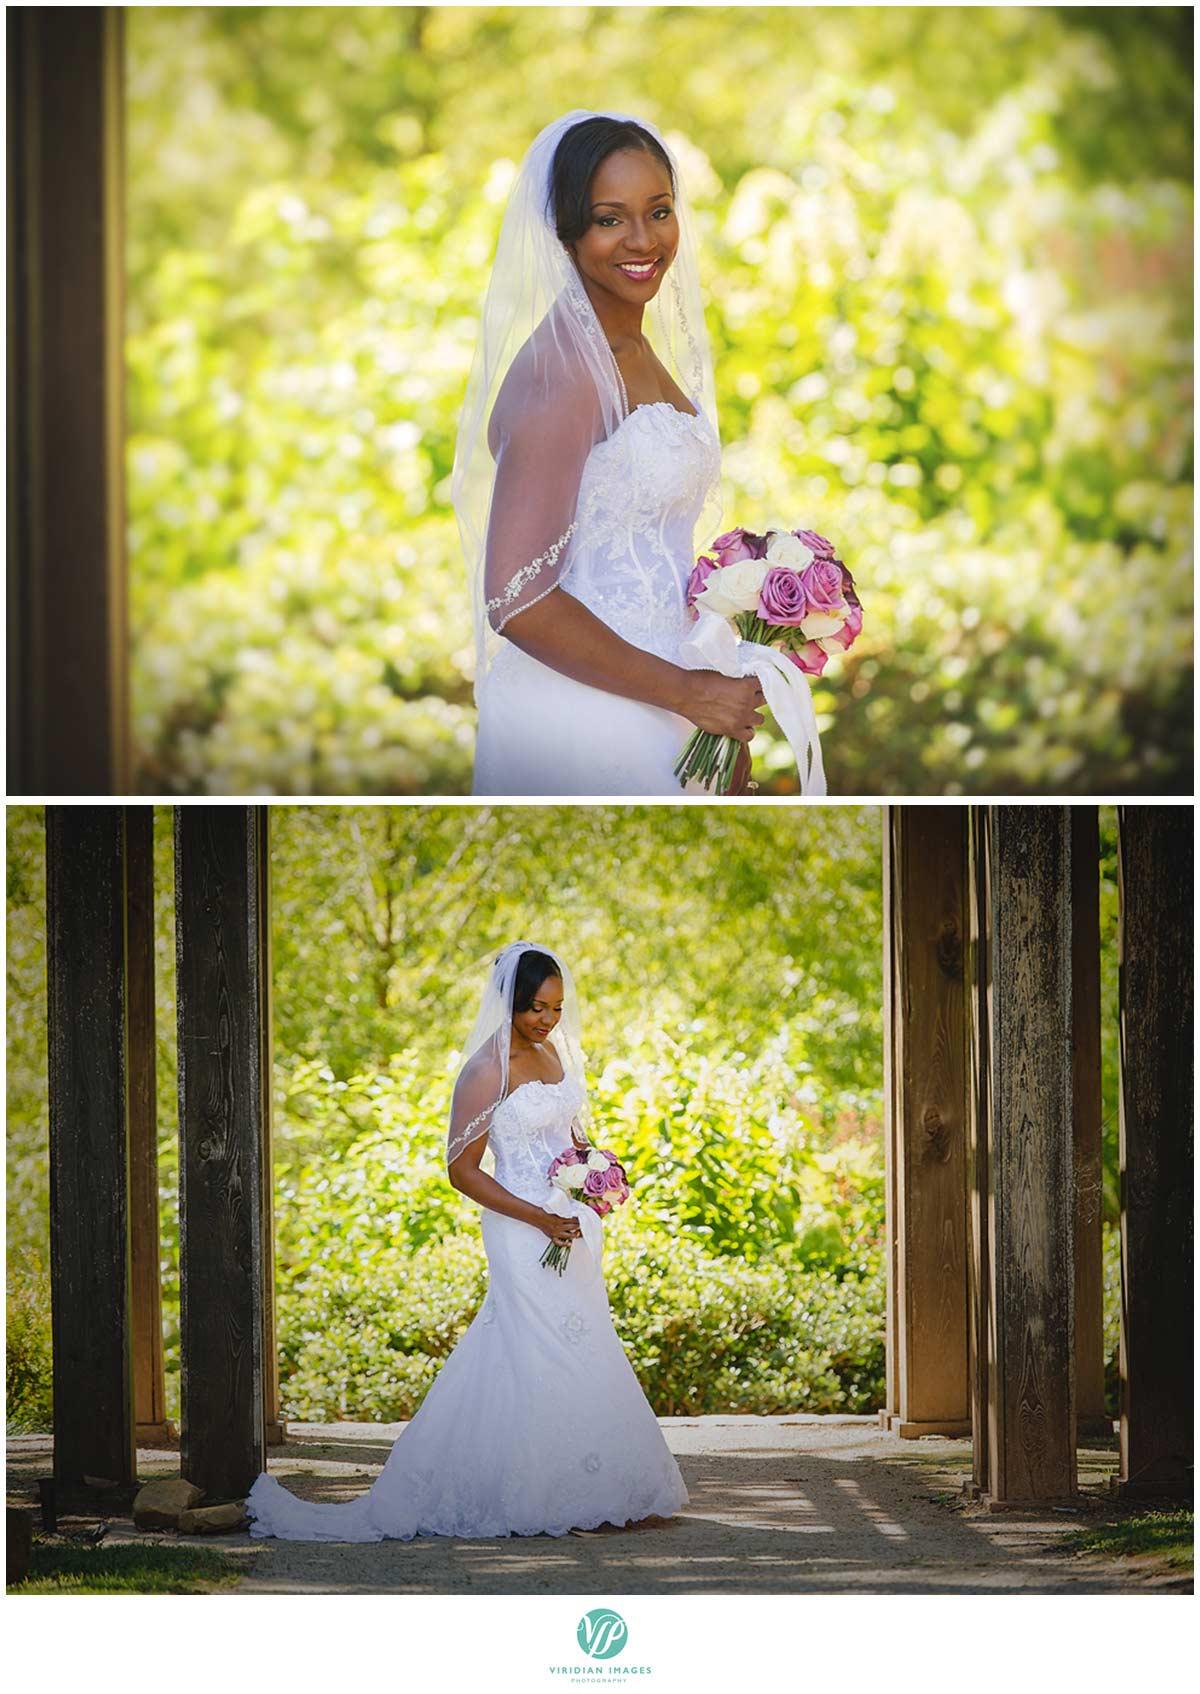 callanwolde-Atalanta-wedding-photographers-bridal-portrait-interracial-photo-18